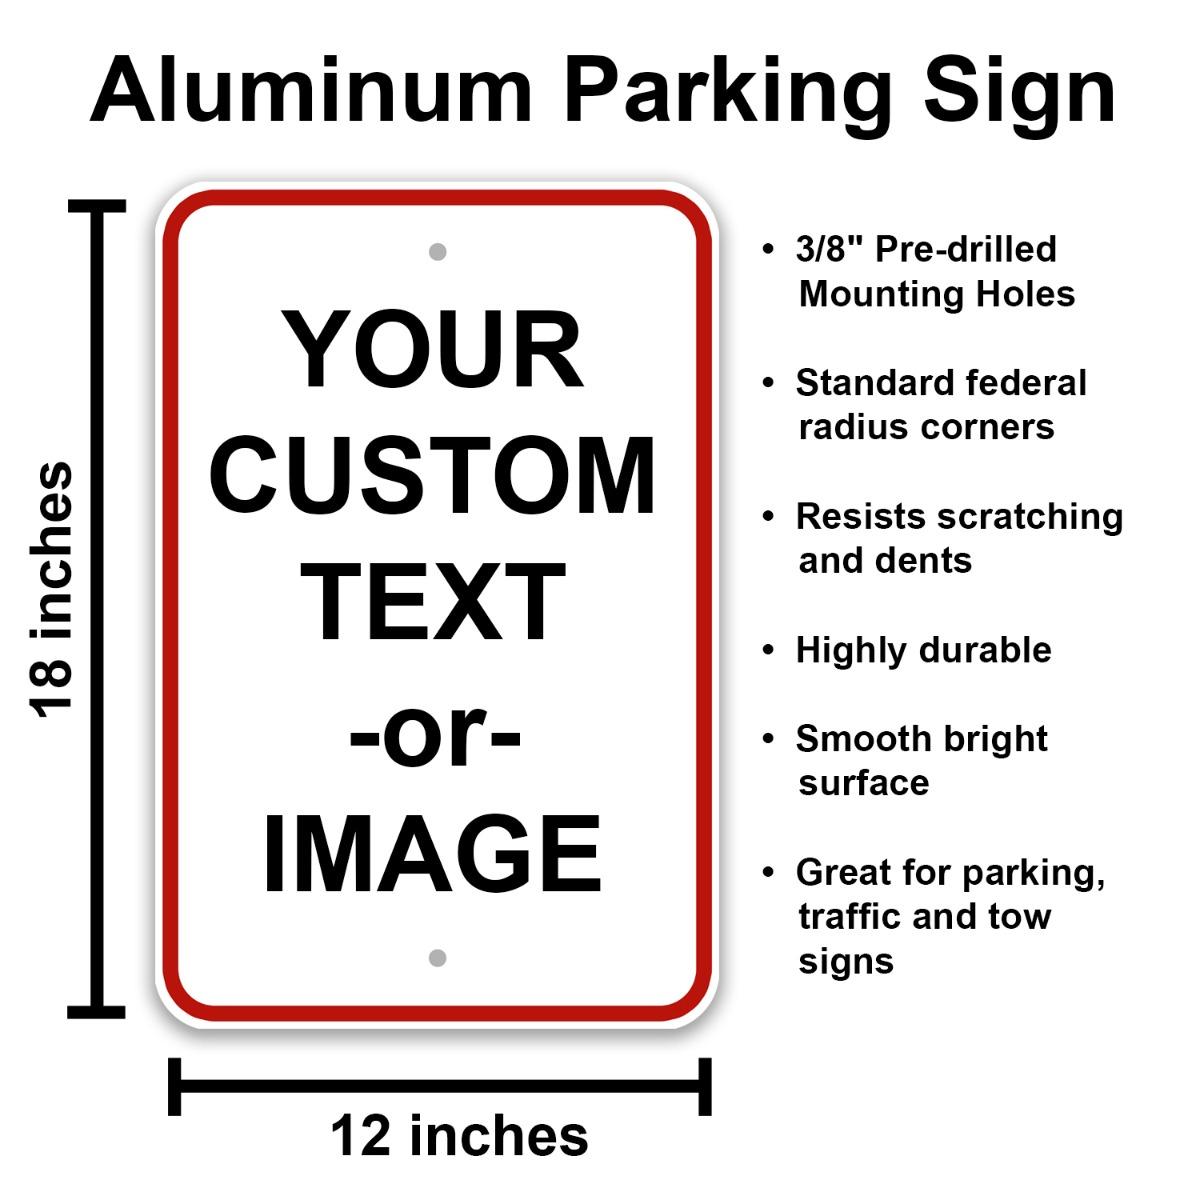 parking sign specs